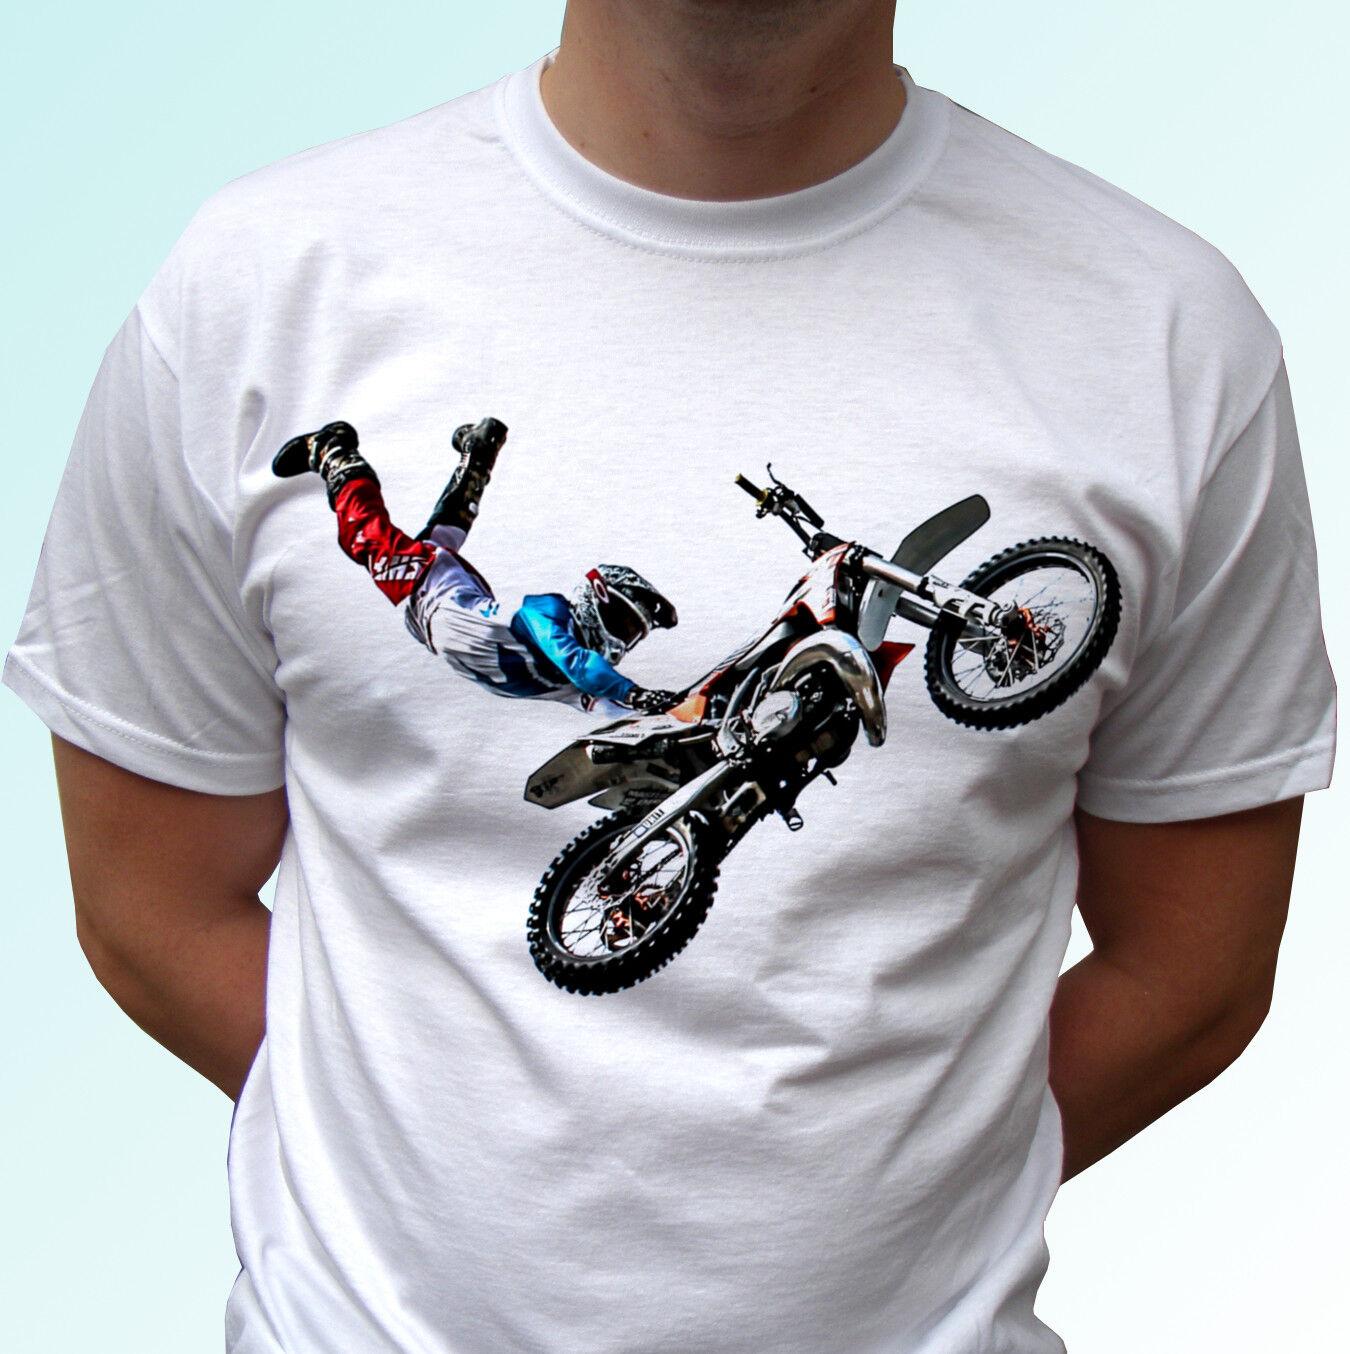 b0ef0efe3505e Freestyle Motocross jump white t shirt sport tee motorcycle top bike rider  summer o neck tee